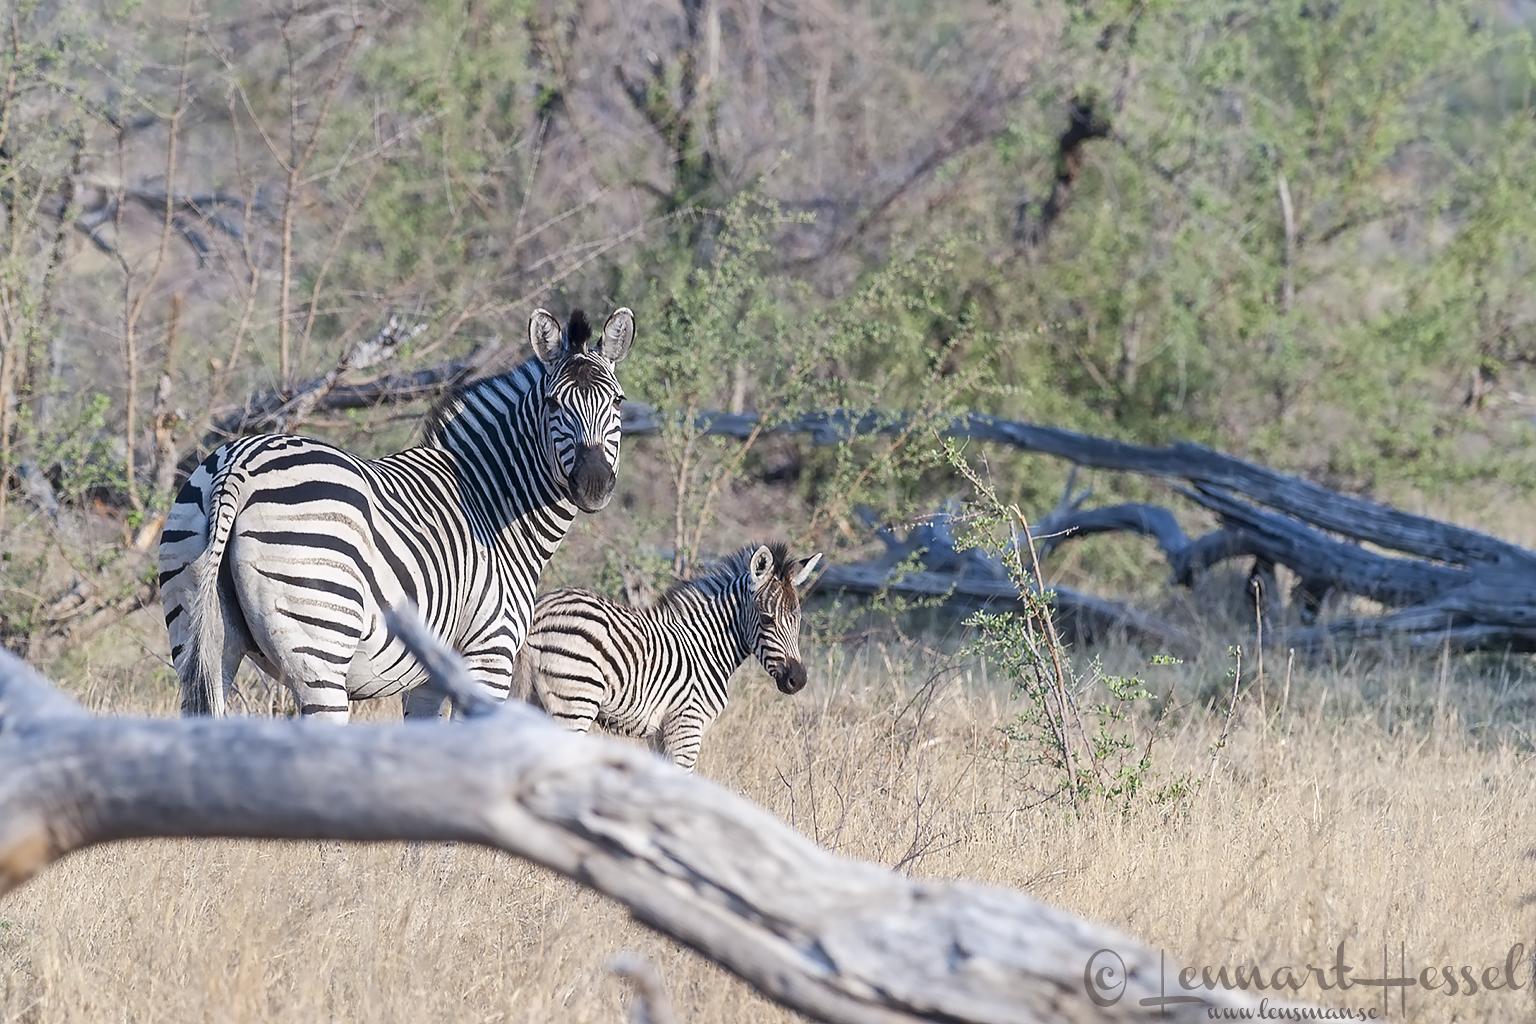 Zebra with foal in Khwai Community Area, Botswana